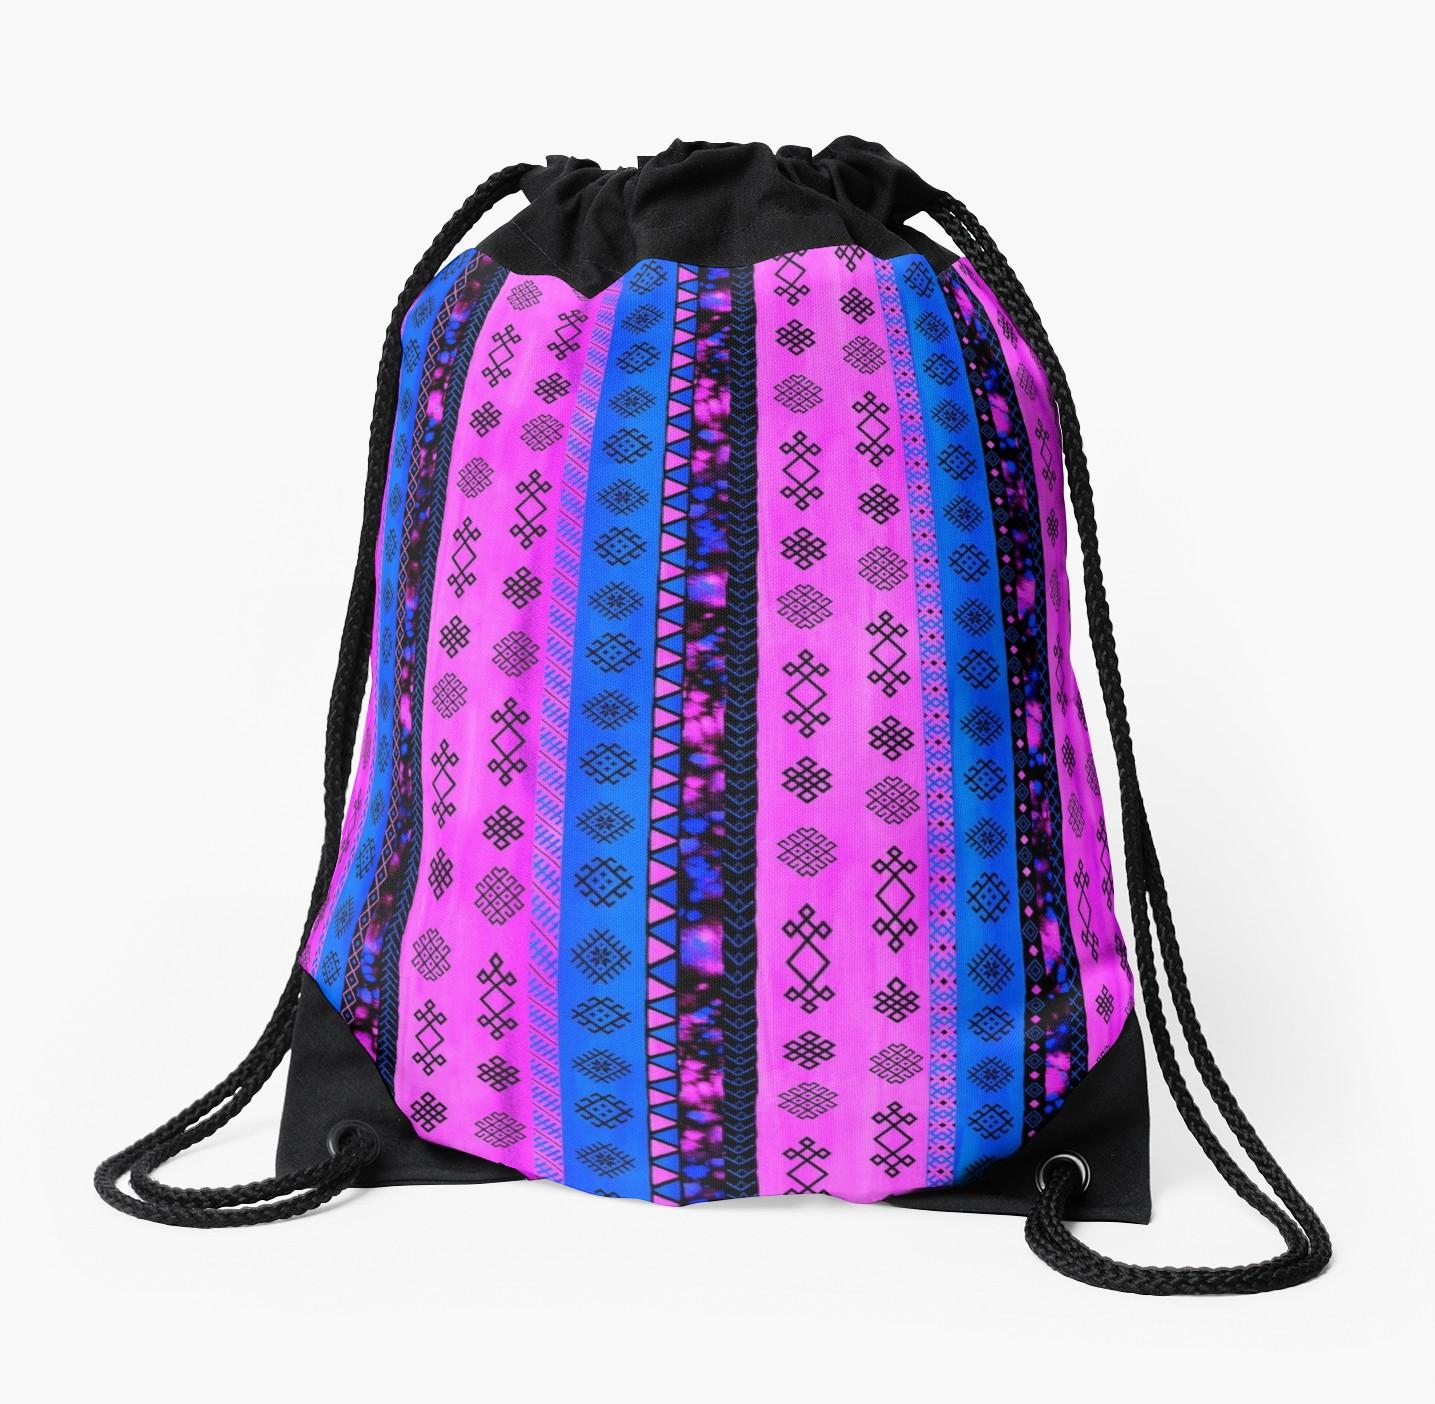 c634889e217b 1435x1404 Pink Watercolor Backpack Fenix Toulouse Handball